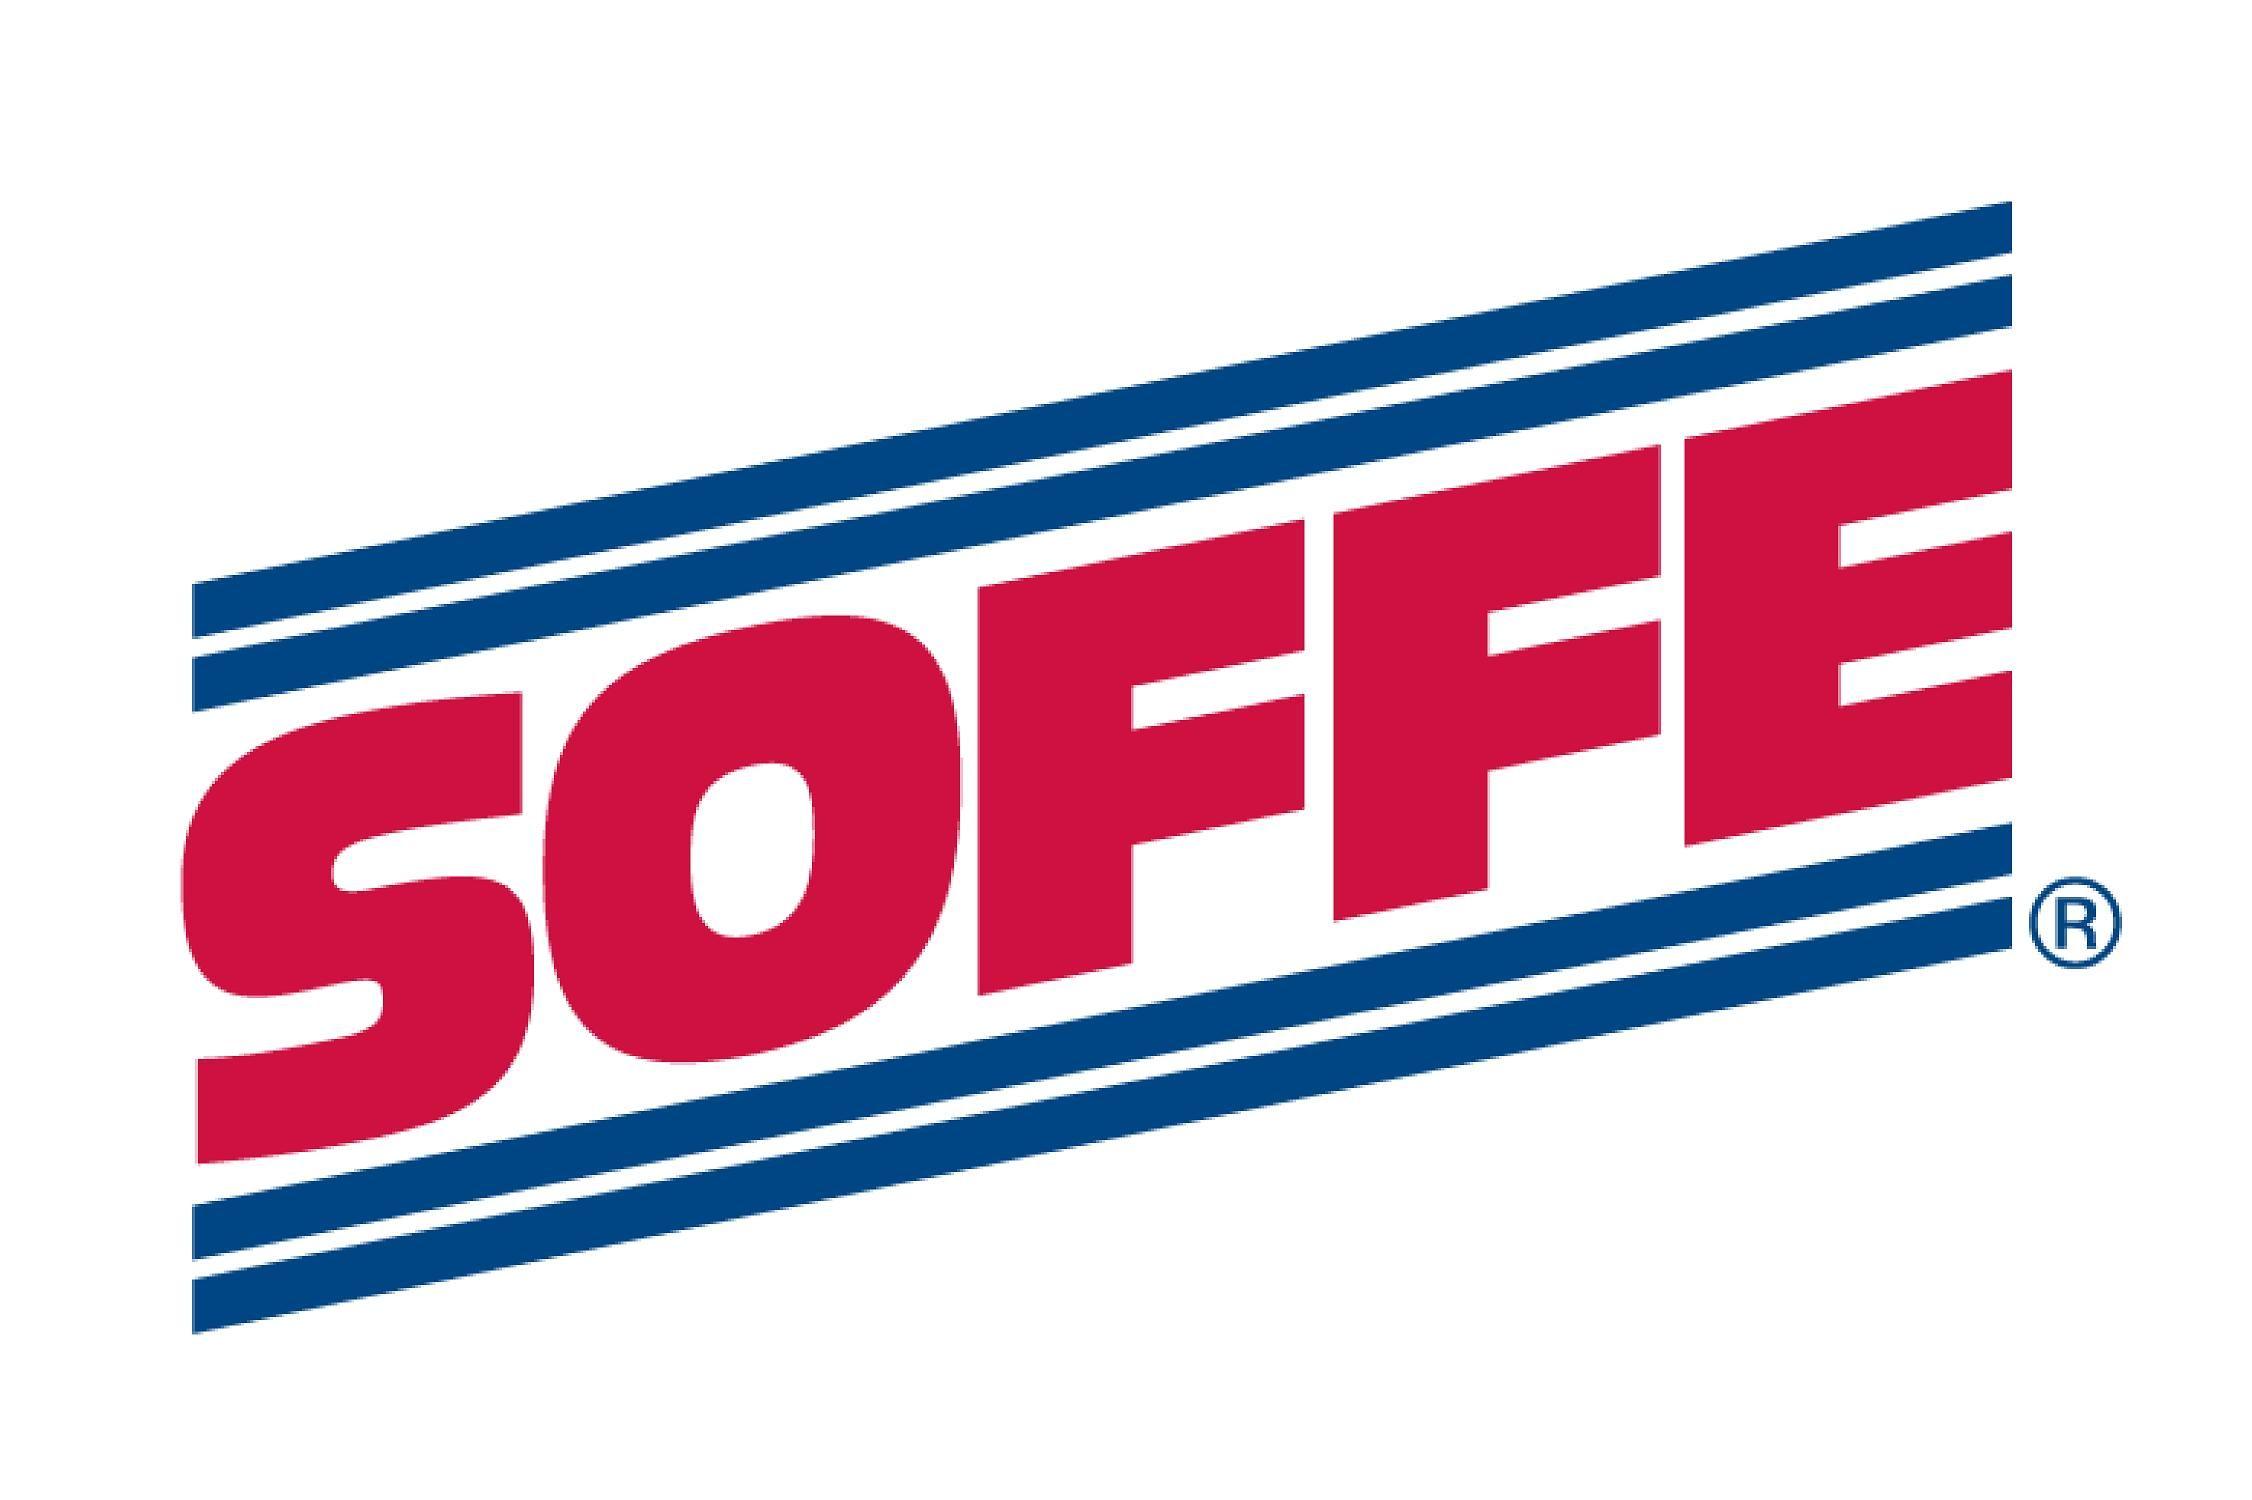 Soffe